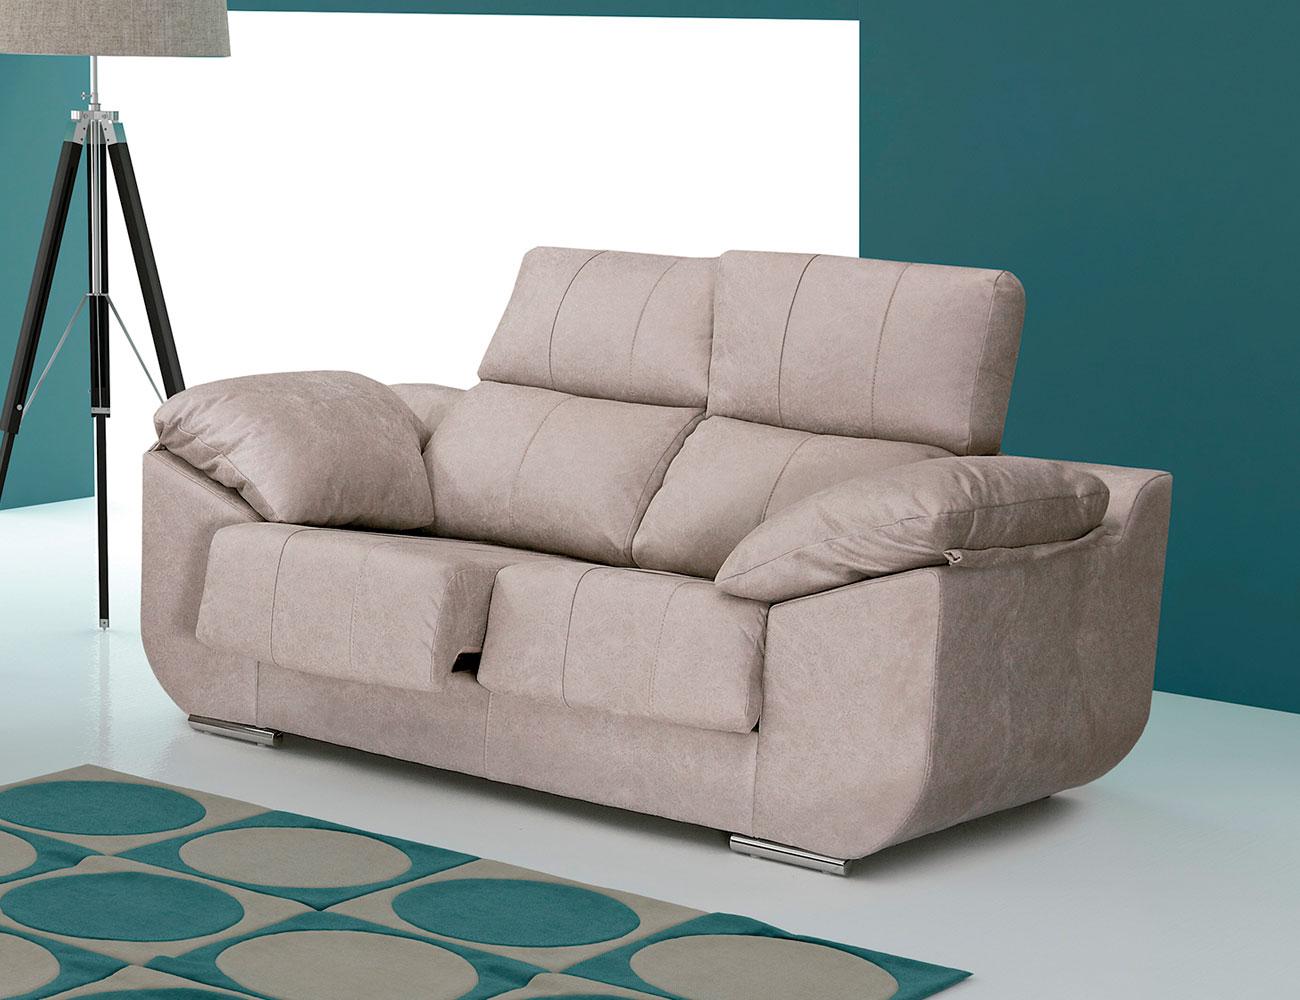 Sof chaiselongue con asientos extra bles y respaldos for Sofas t dos opiniones